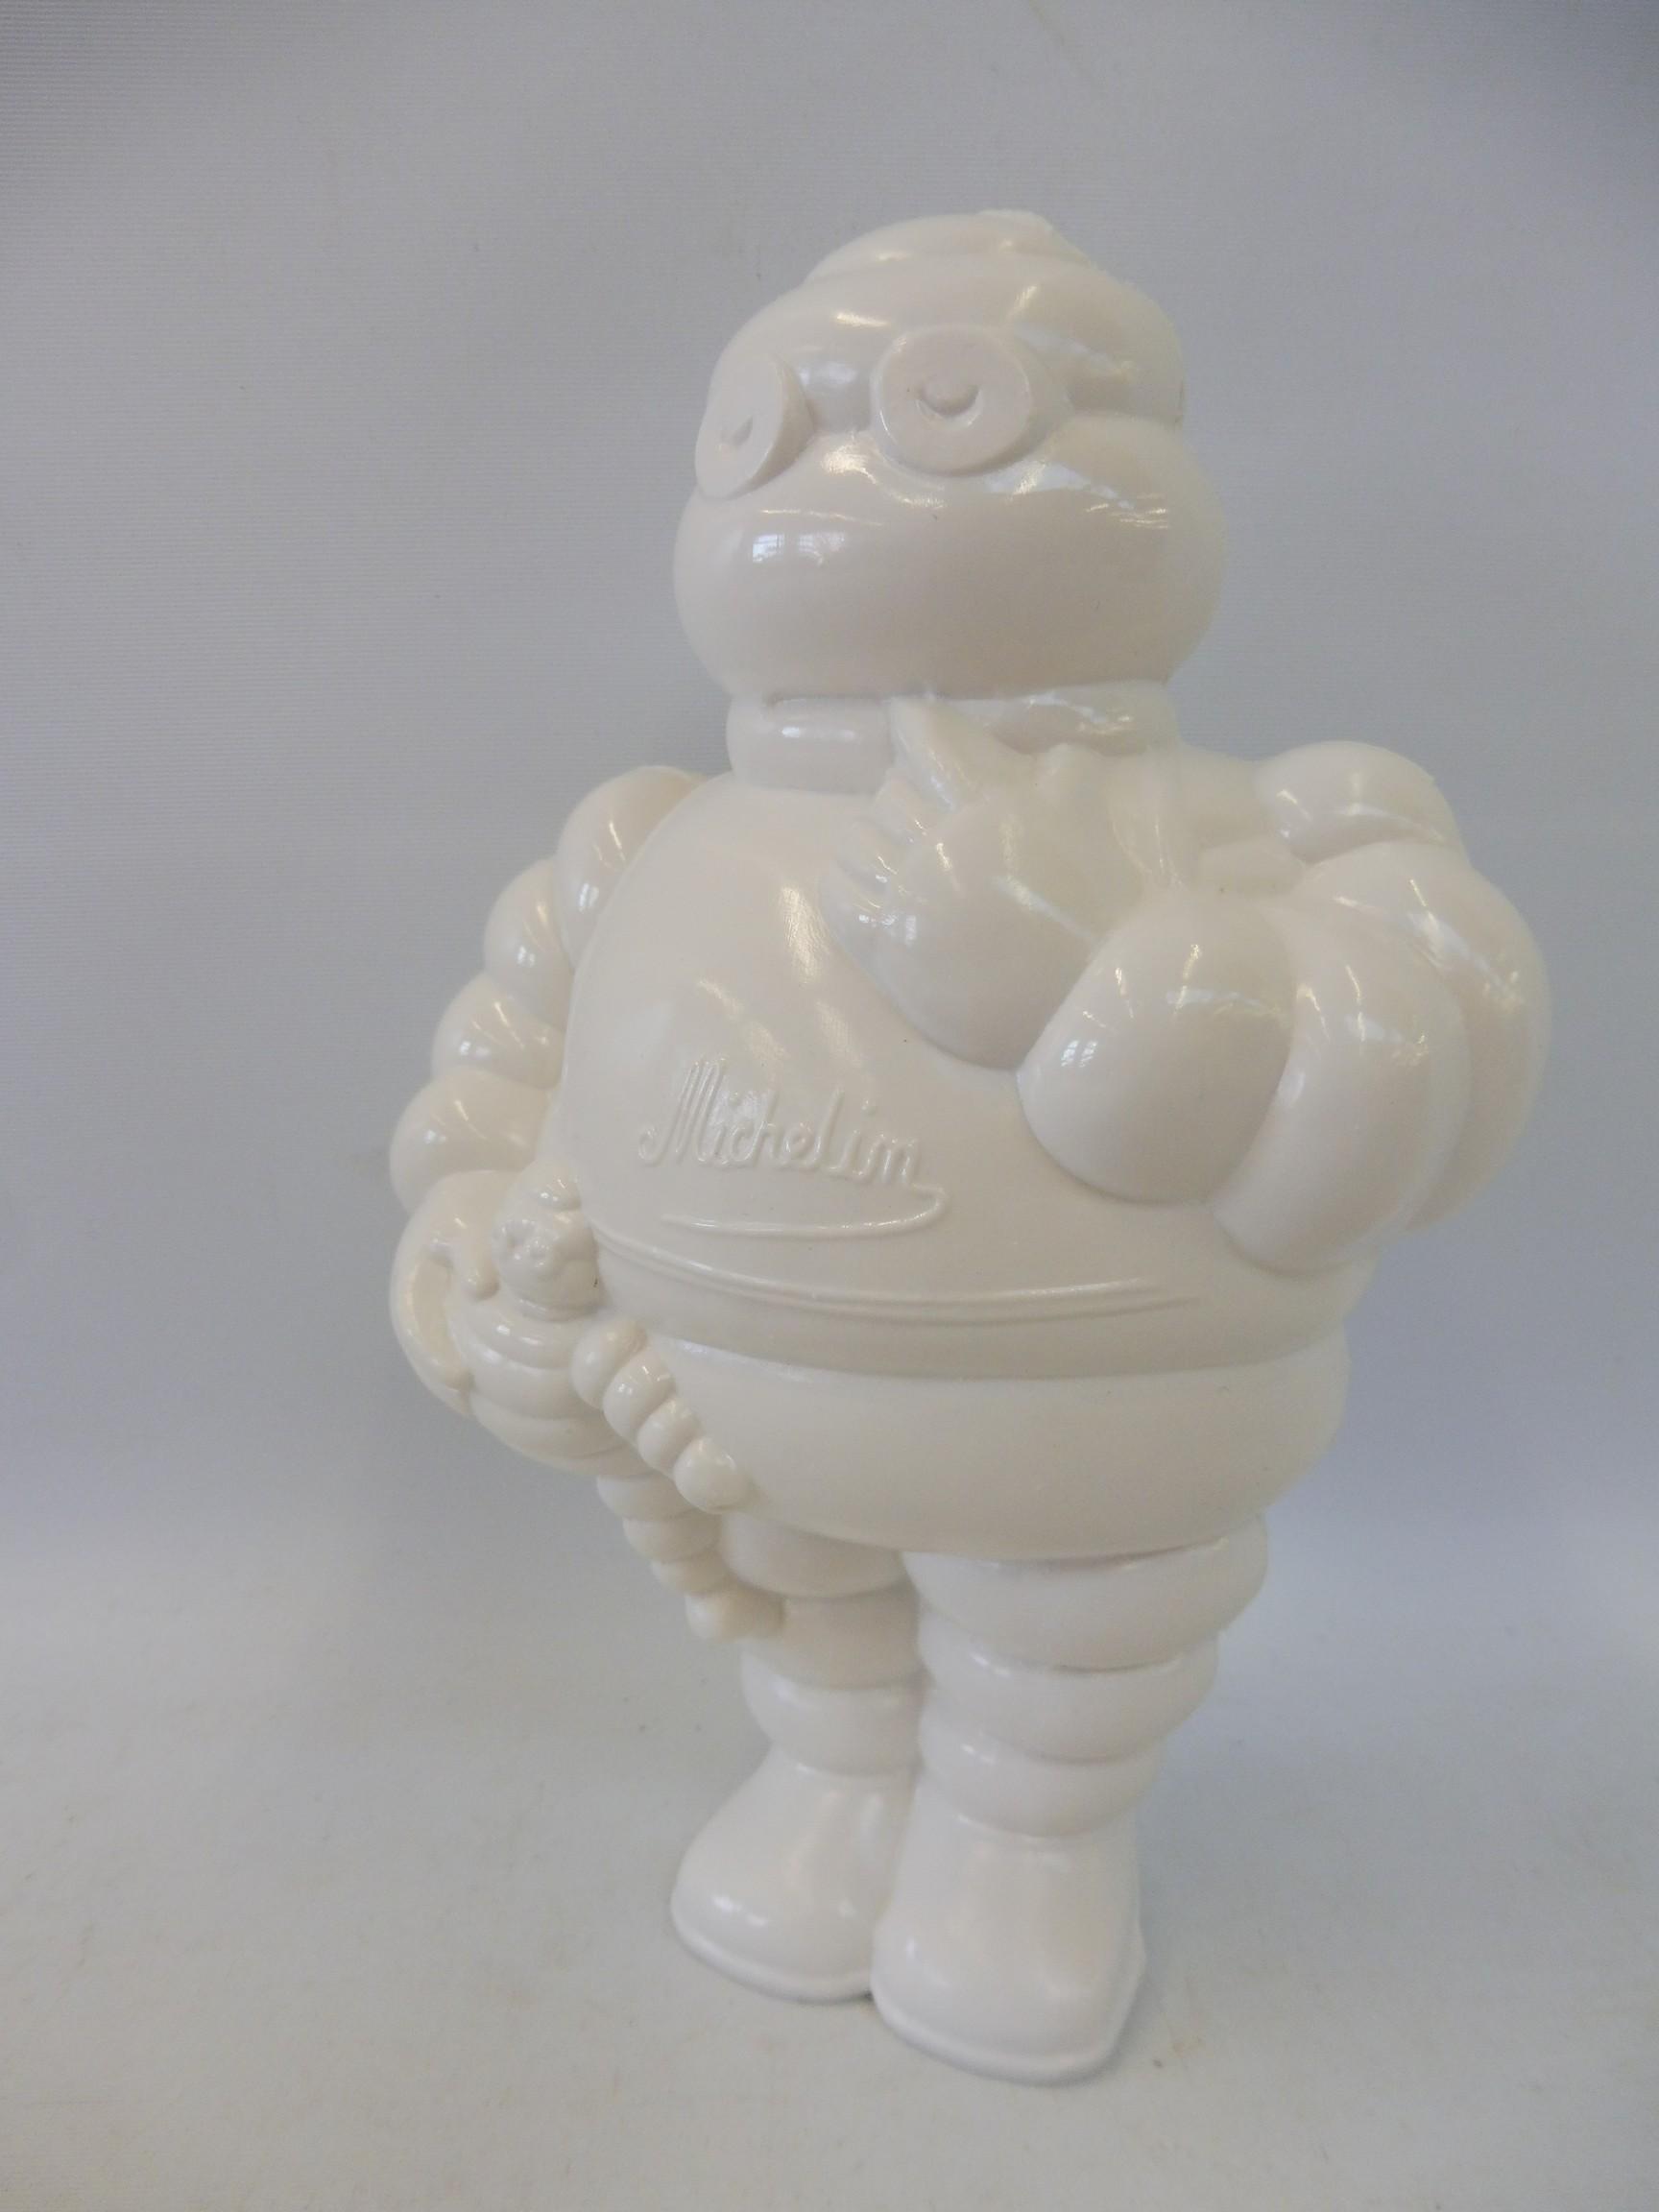 A Michelin plastic figure with a squeak noise maker inside.